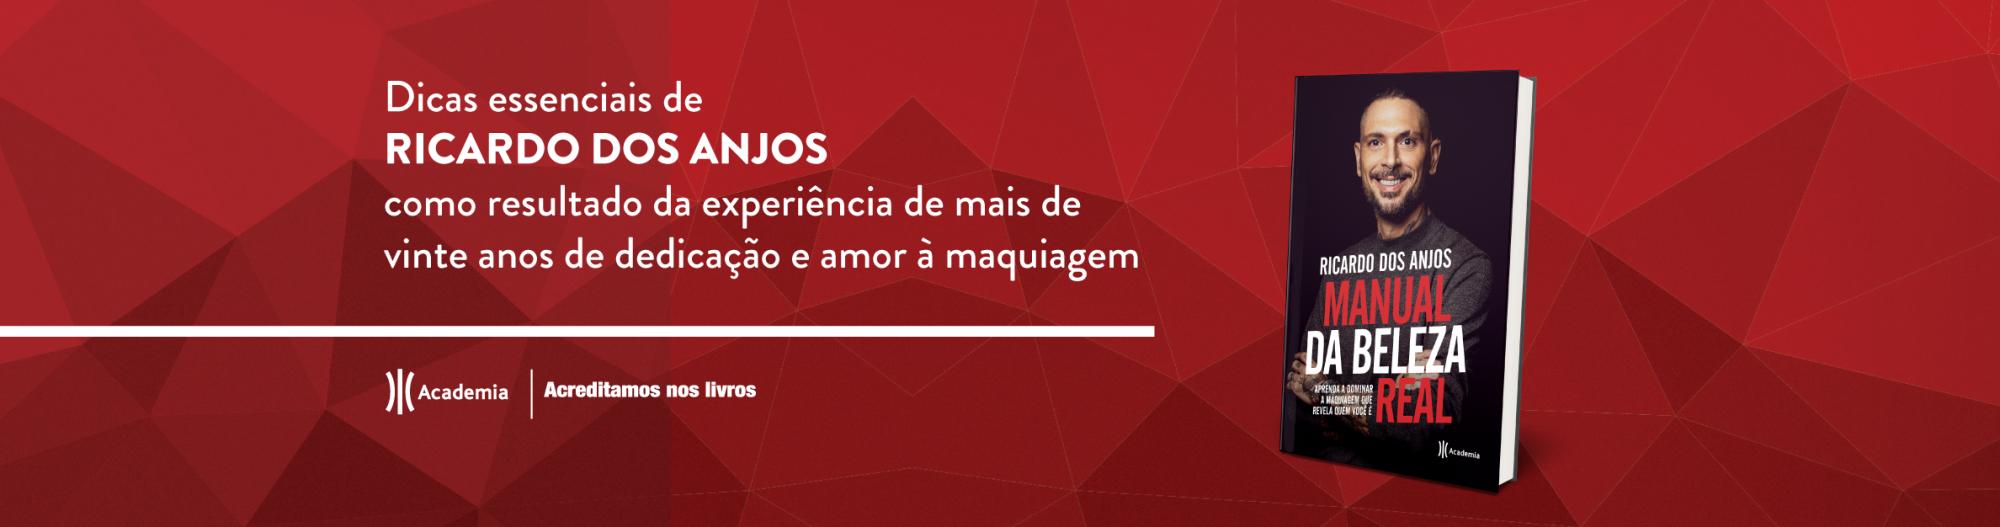 267_1_Manual_da_beleza_real-1140x300.png